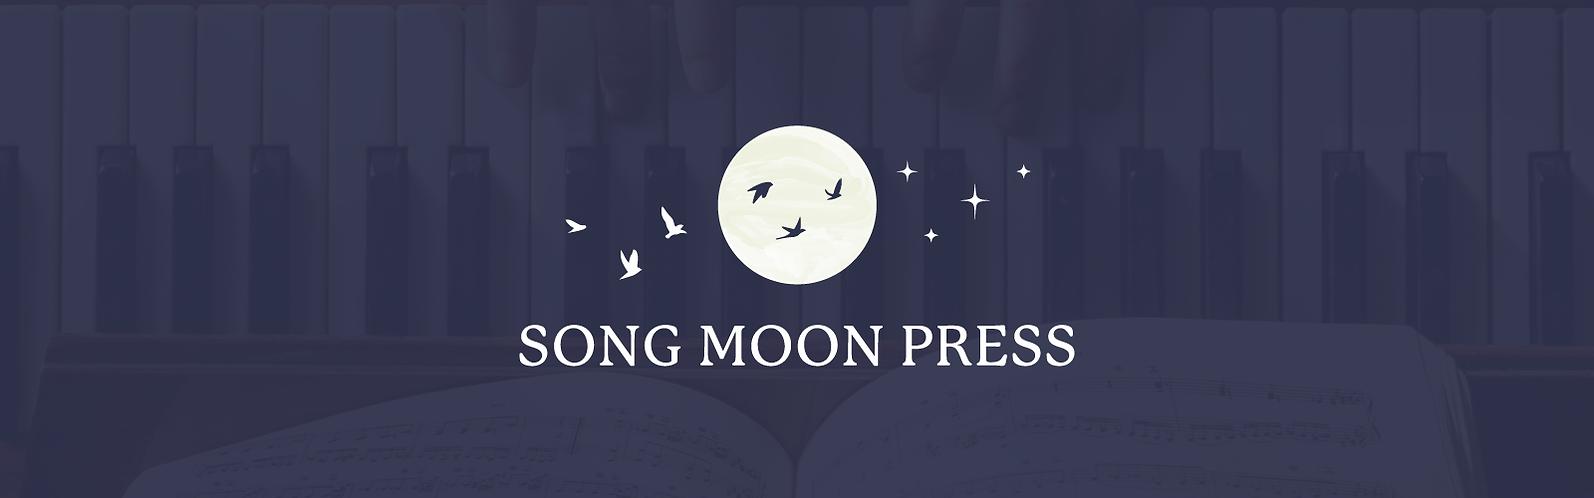 branding for song moon press